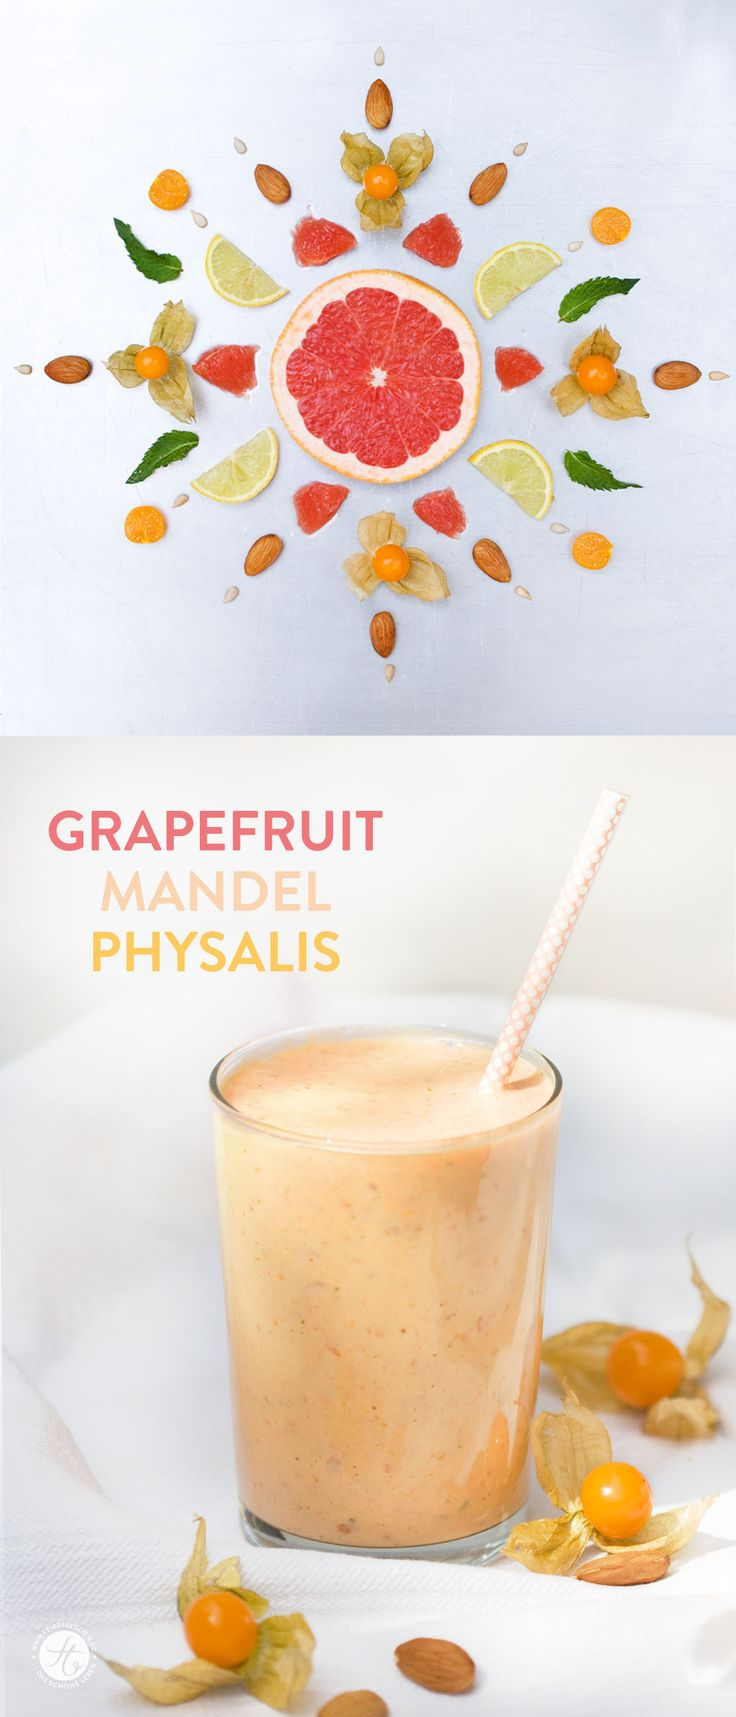 SmoothieMontag | Grapefruit Mandel Physalis Smoothie #feiertaeglich #smoothiemontag